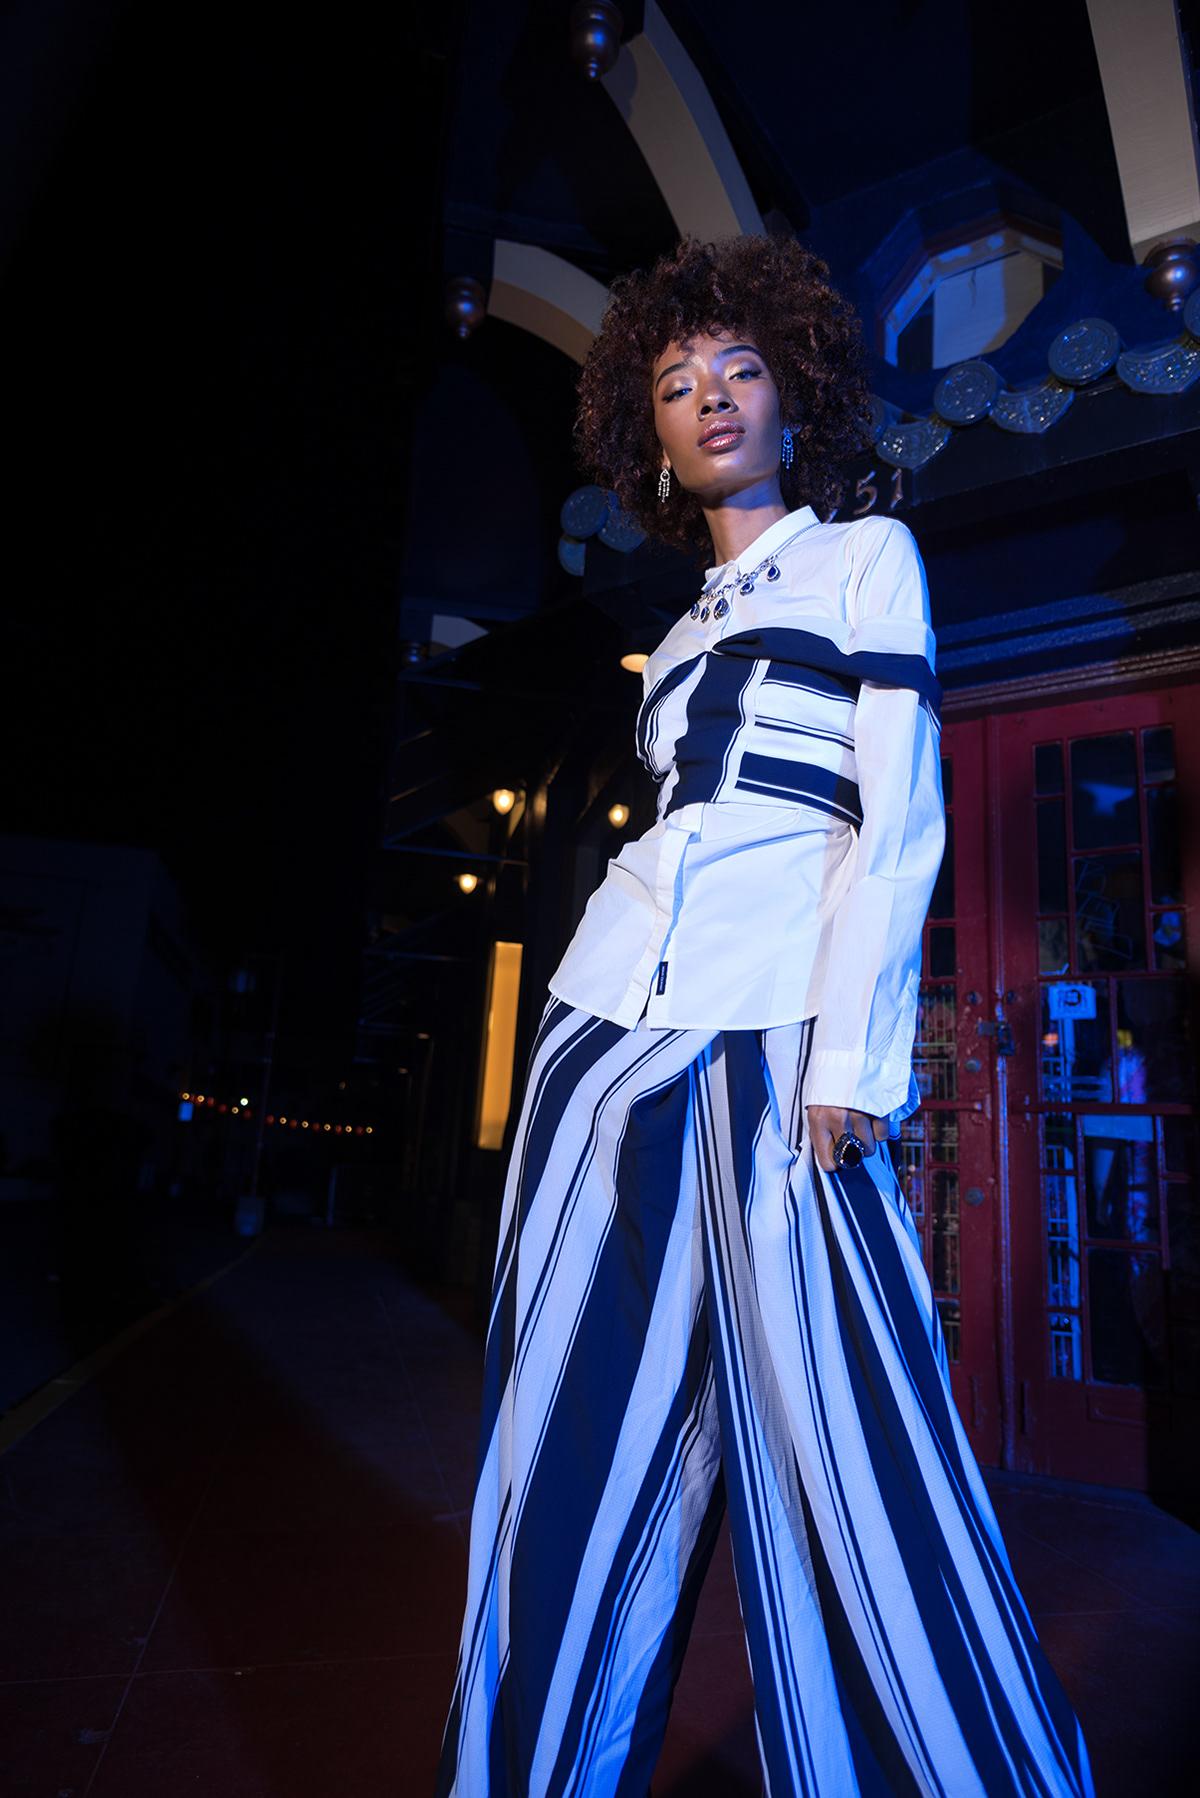 high fashion photographer Los Angeles fashion photography